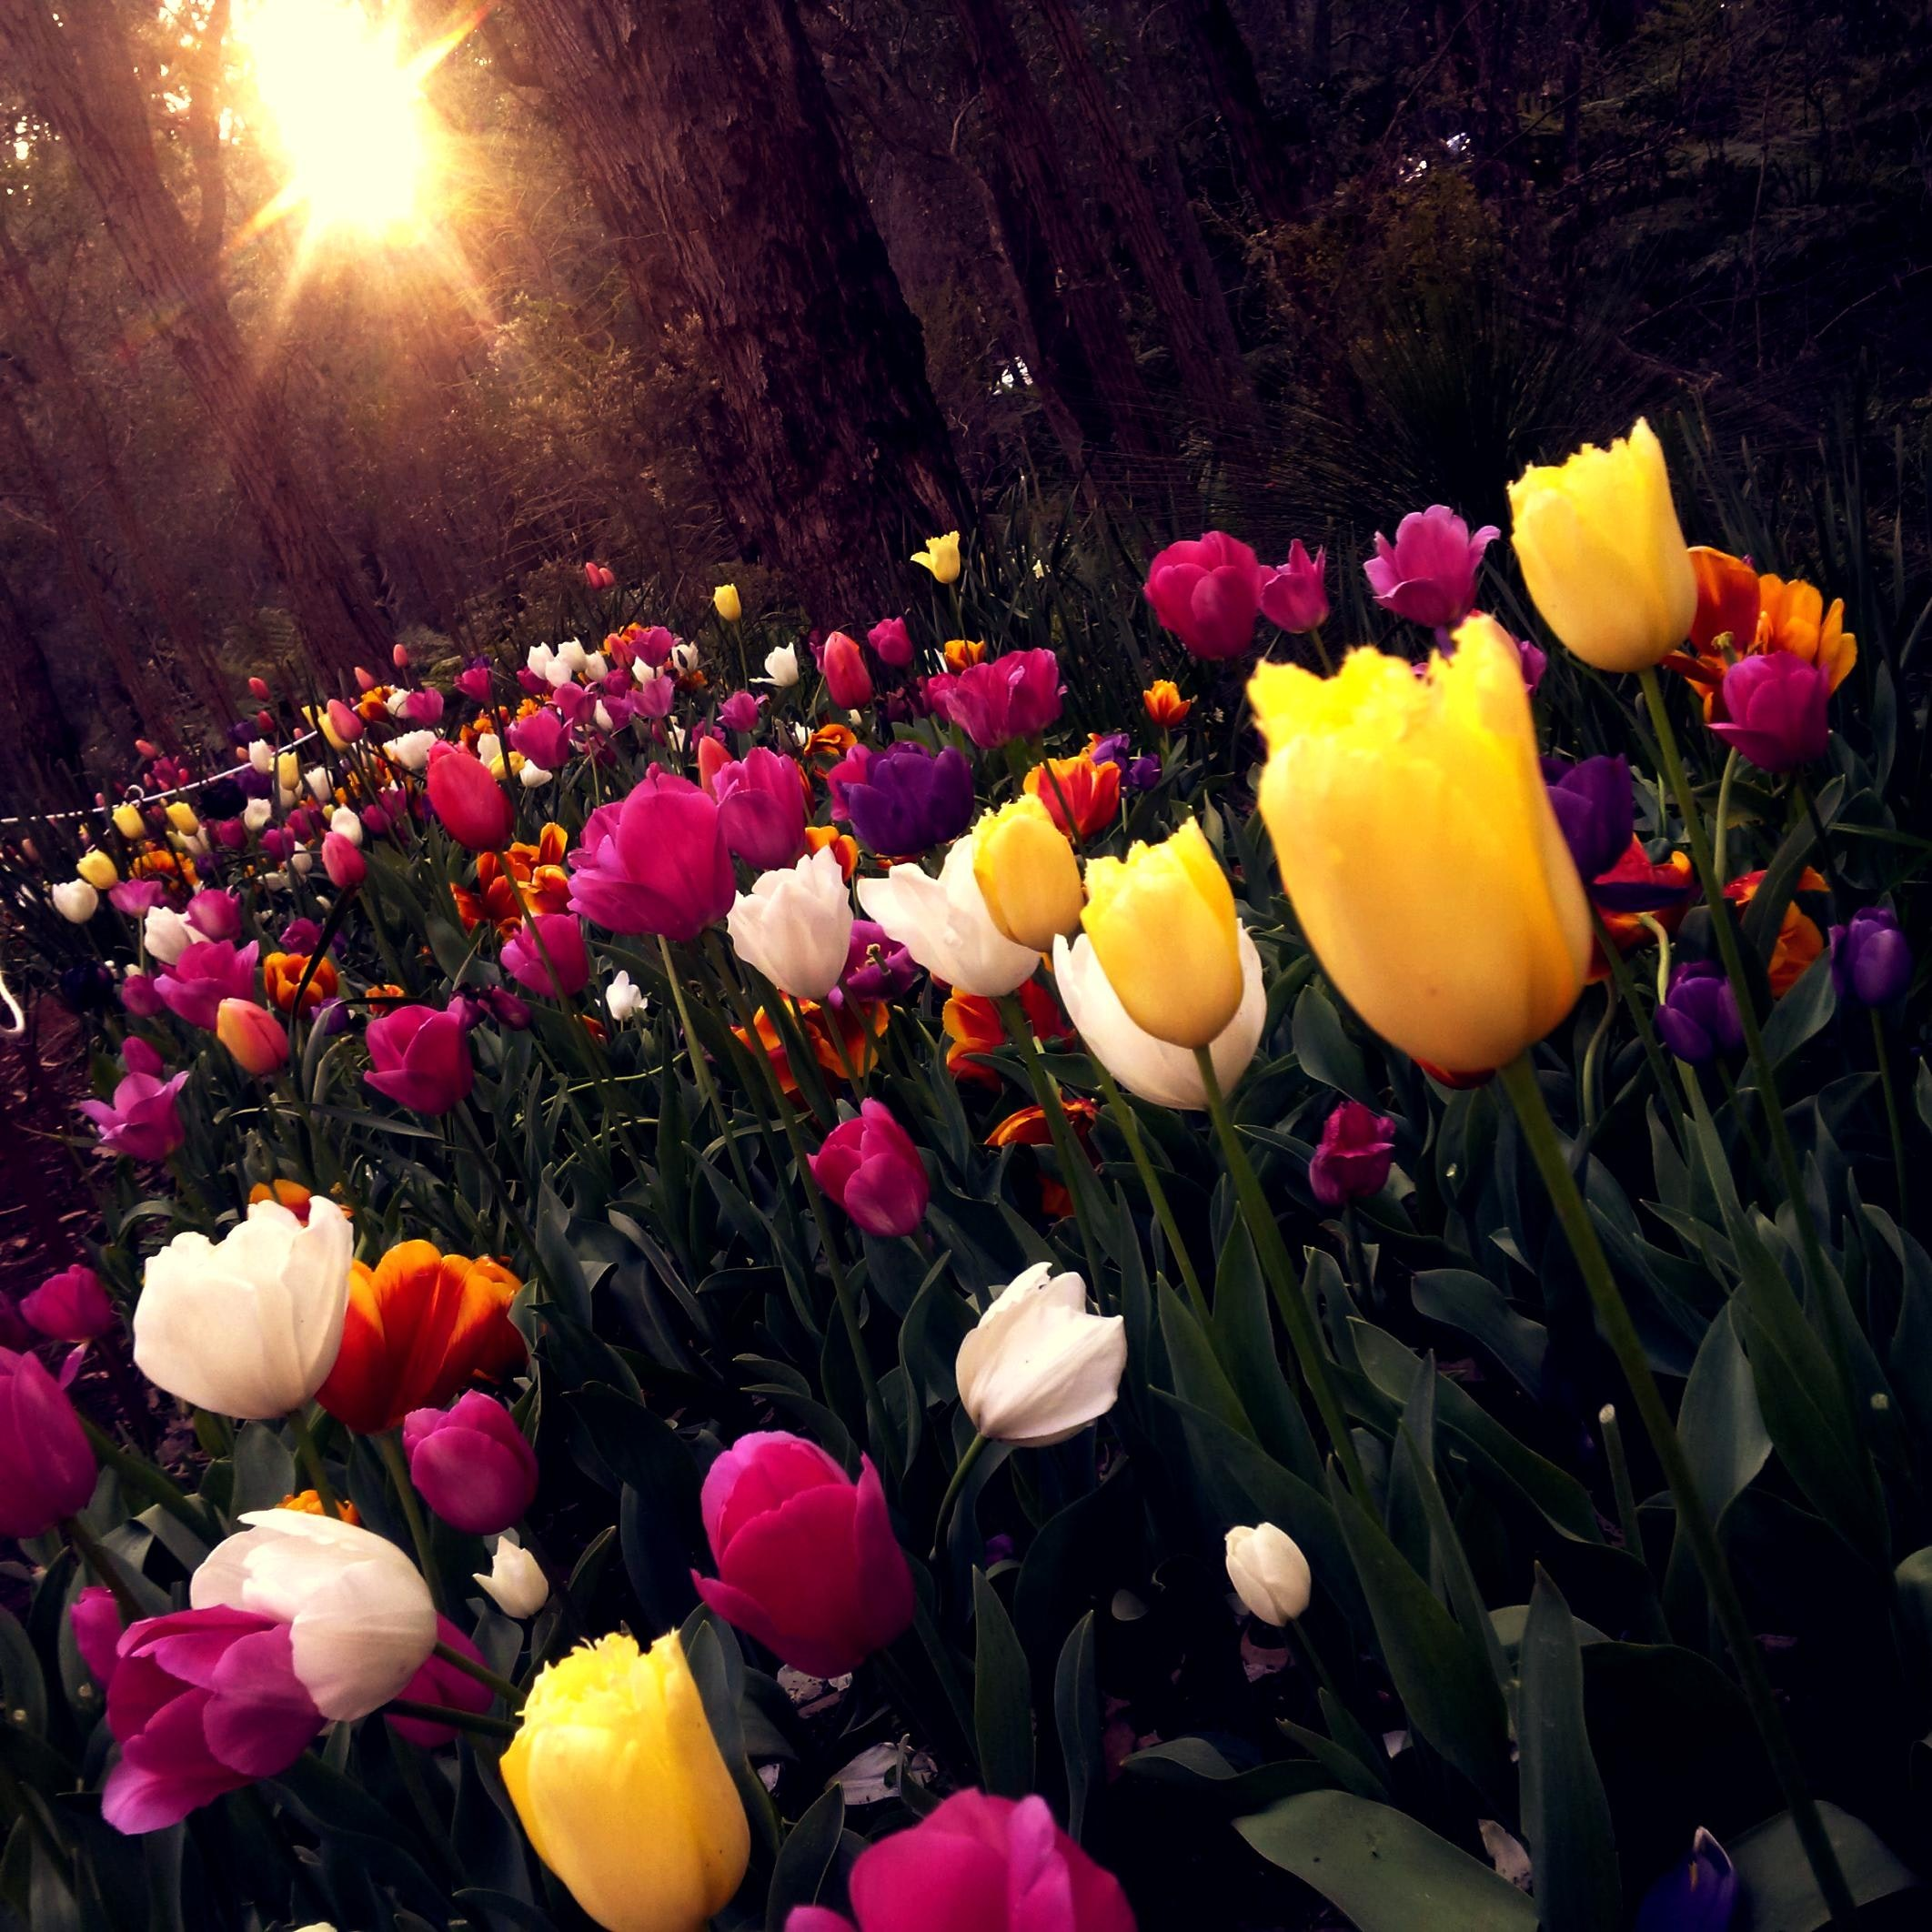 1000 Beautiful Beautiful Flowers Photos Pexels Free Stock Photos